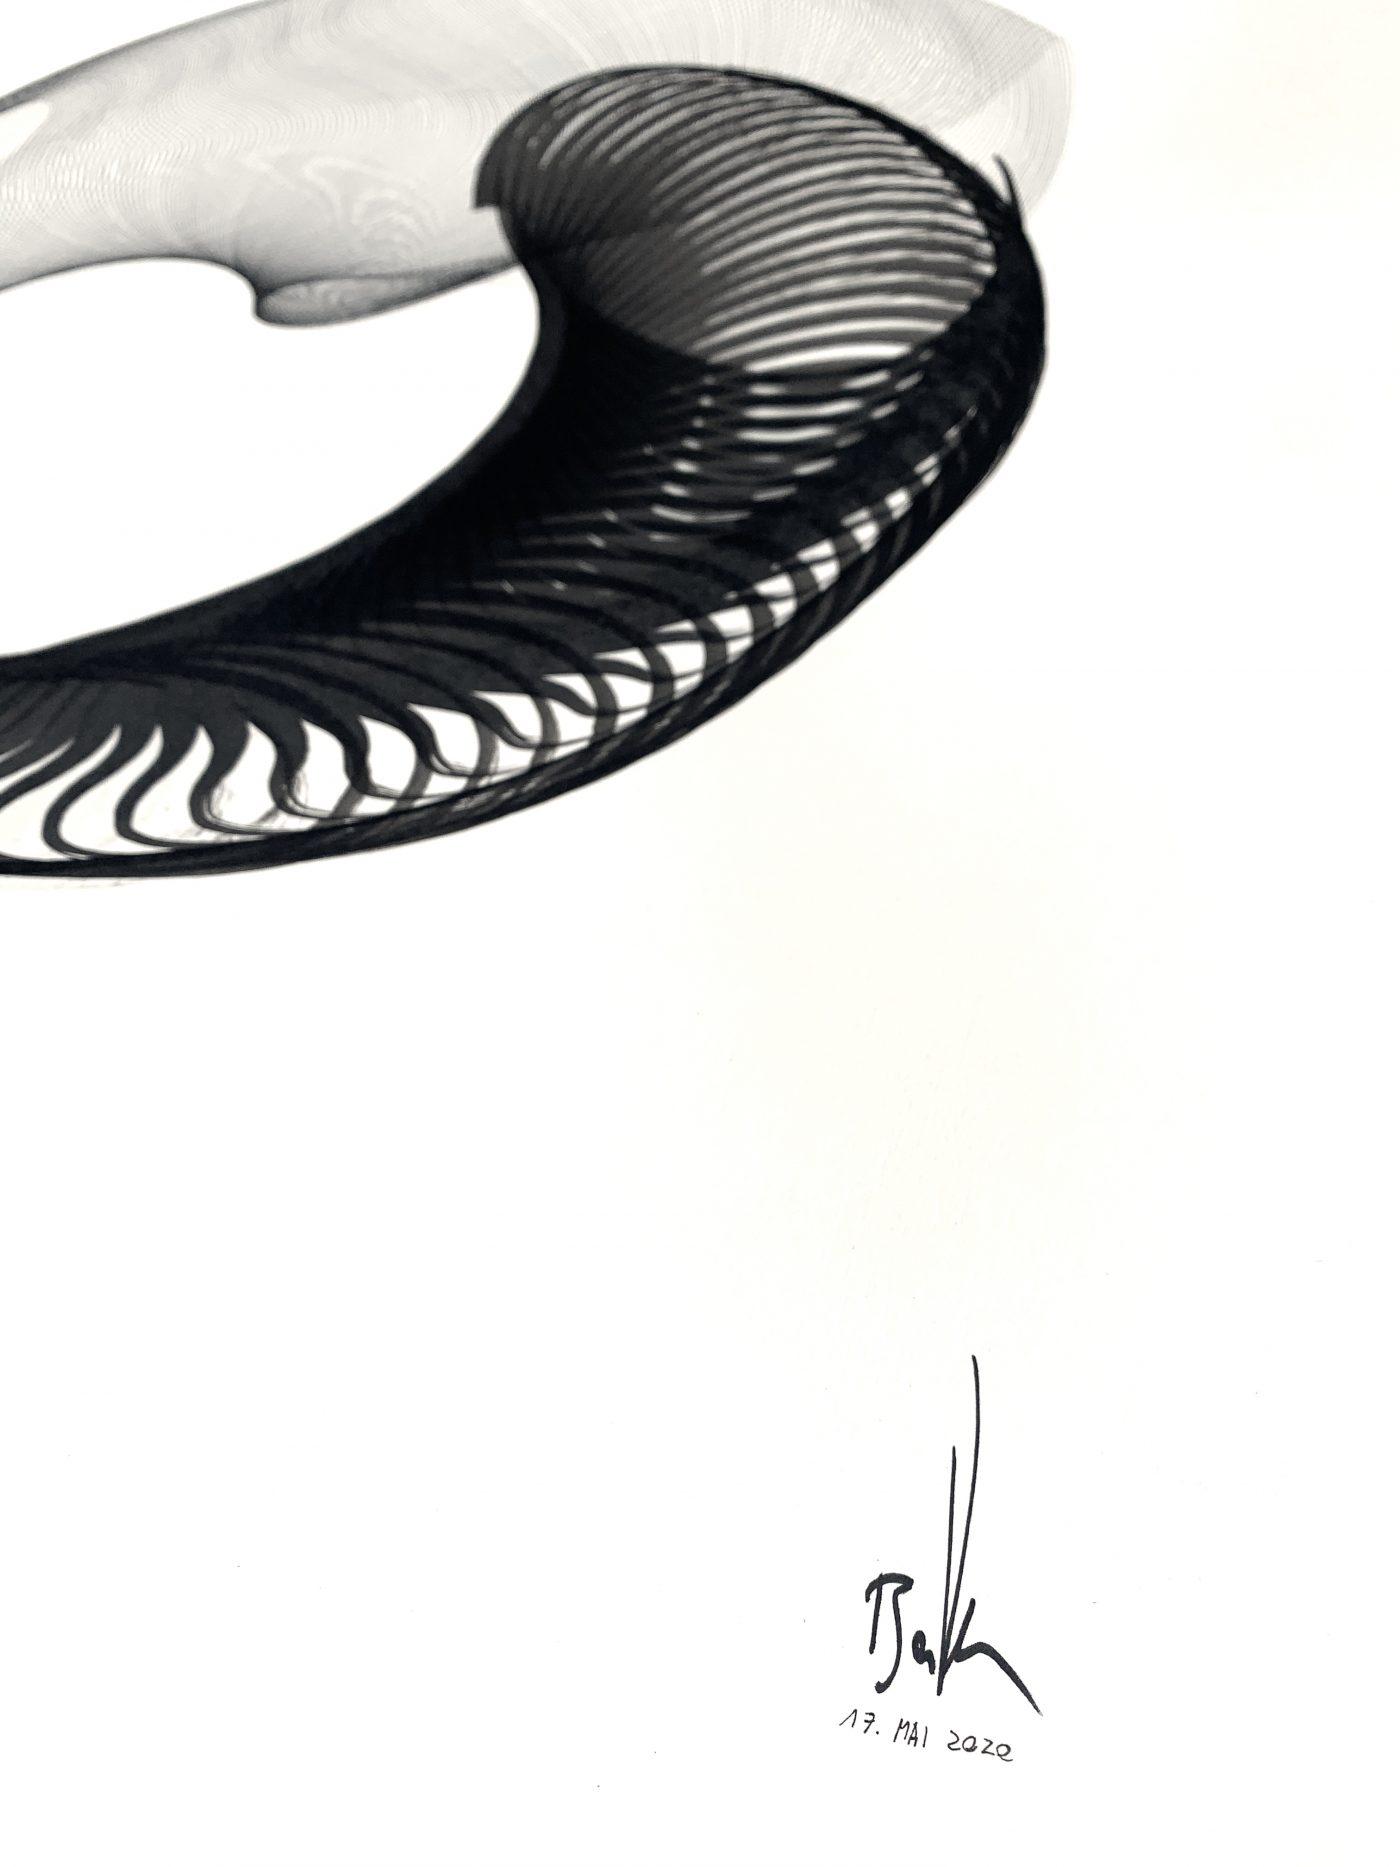 x138 - 17 Mai